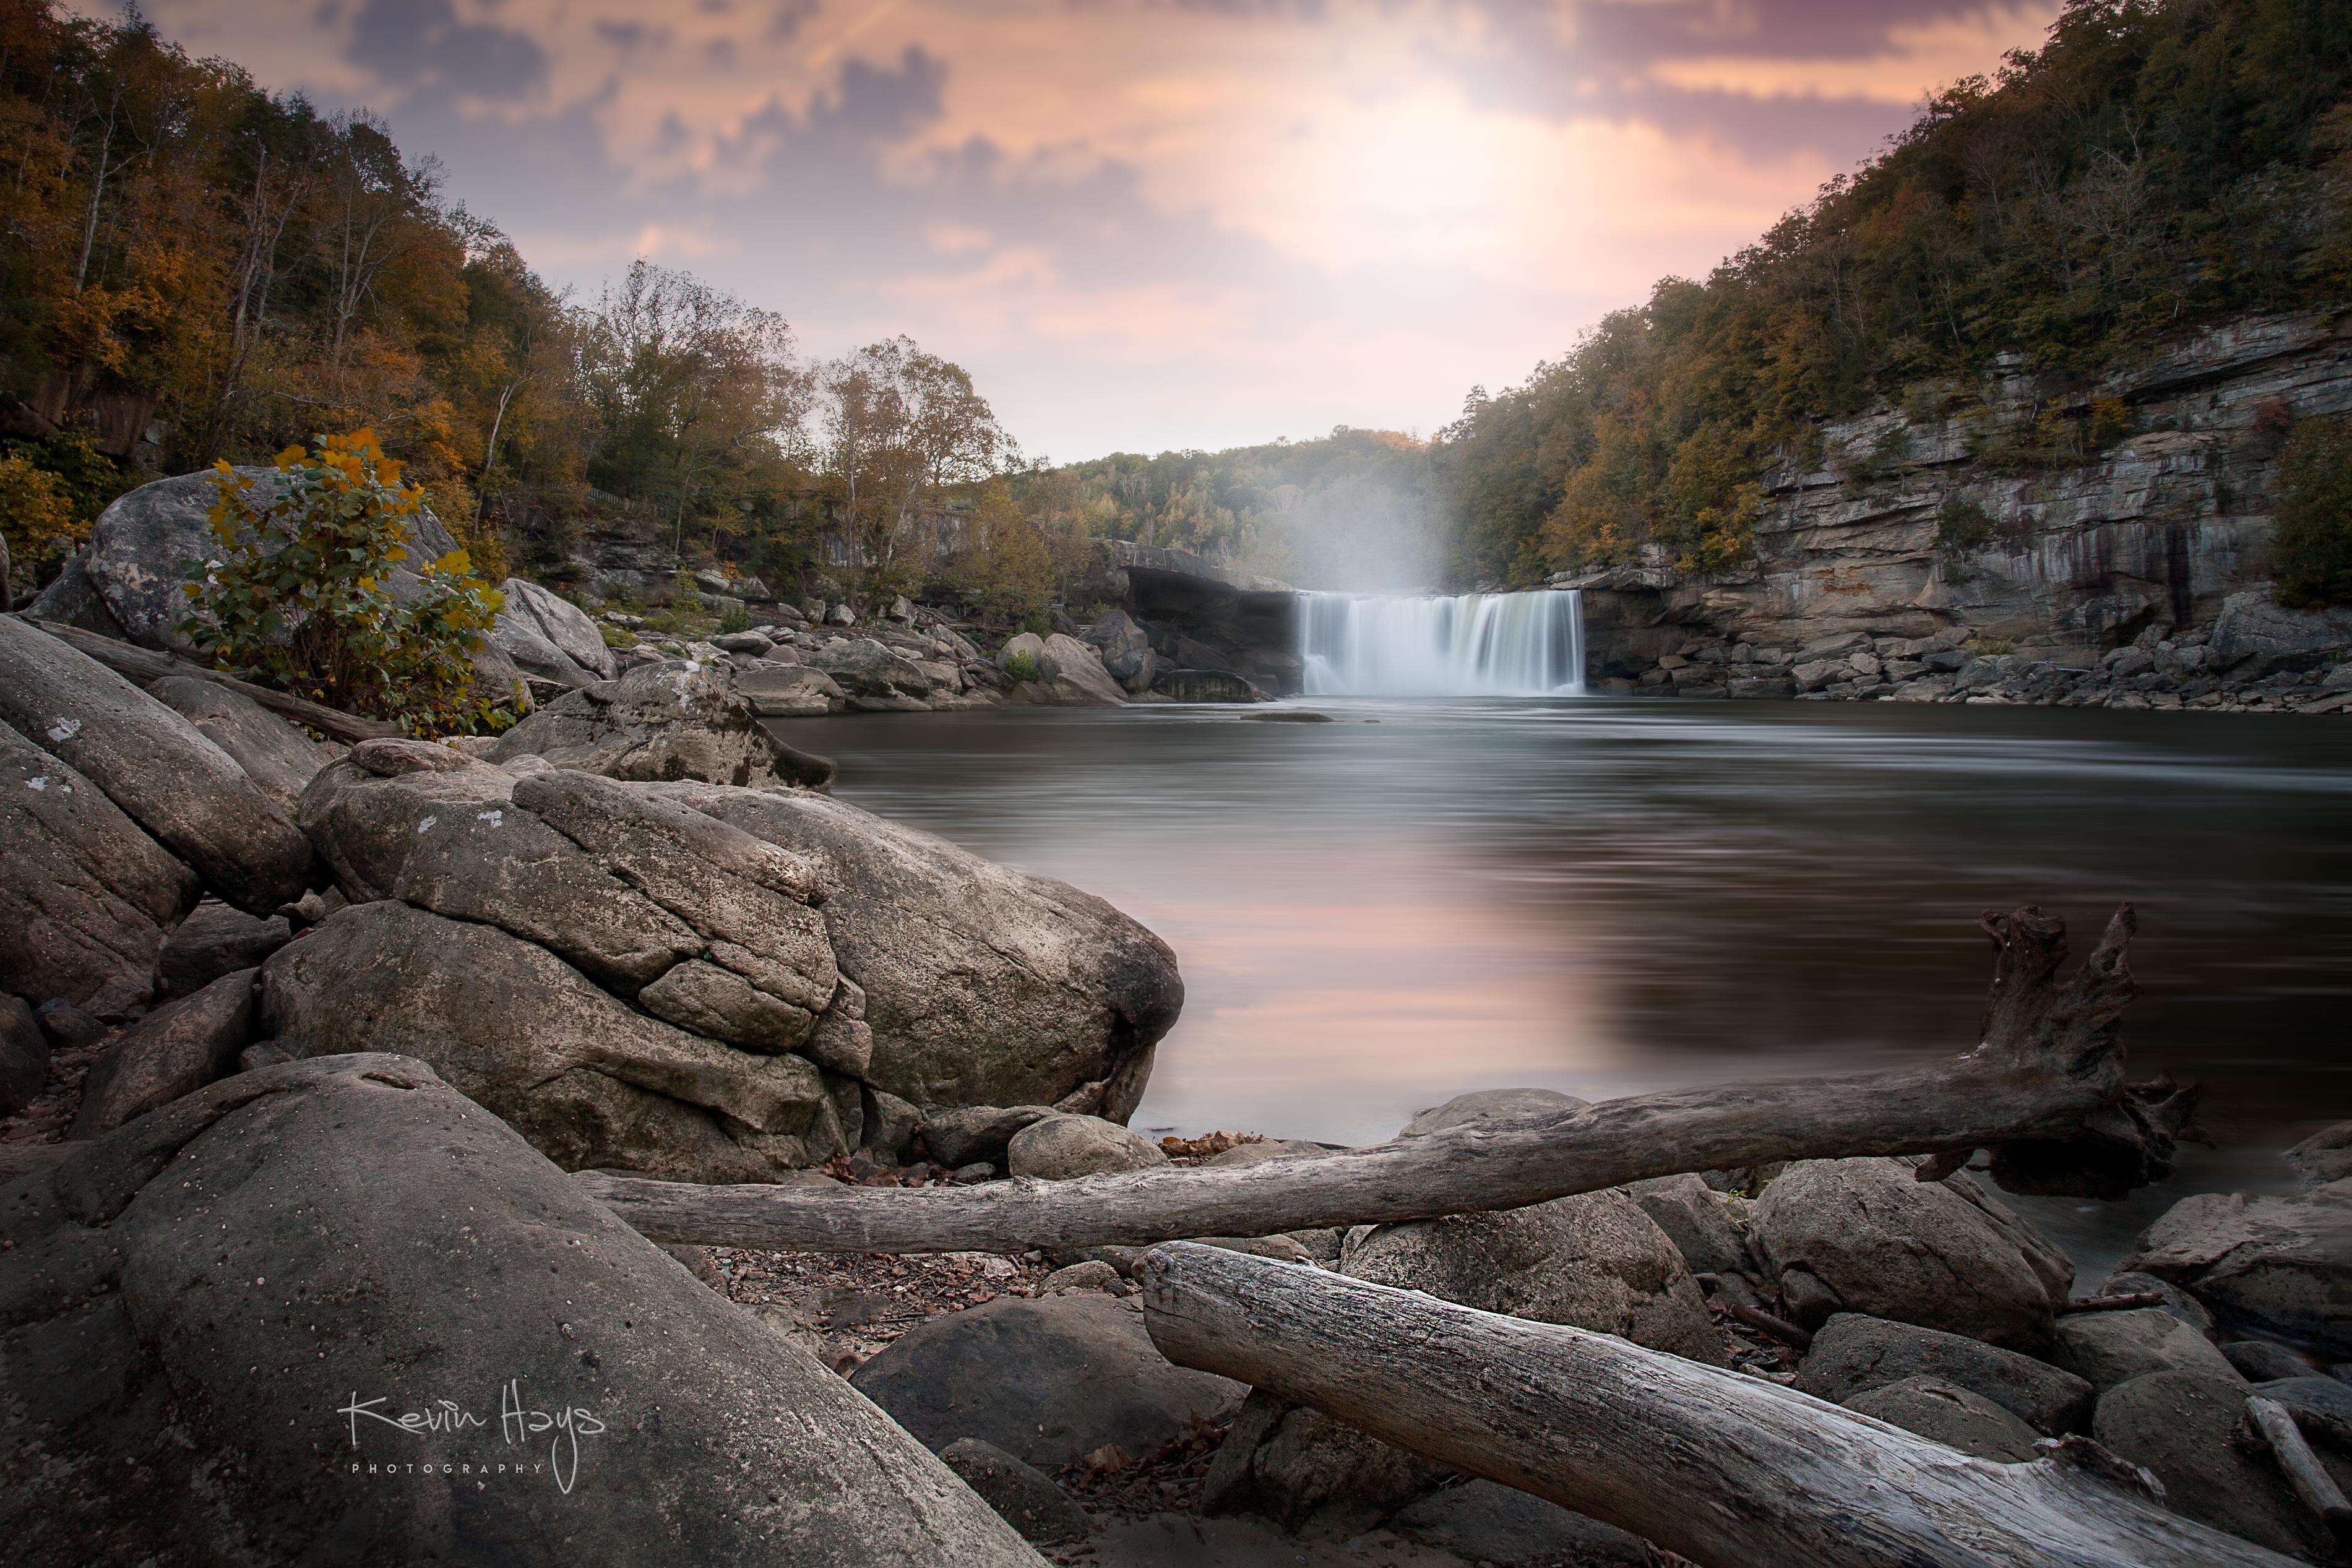 Cumberland Falls   Kevin Hays